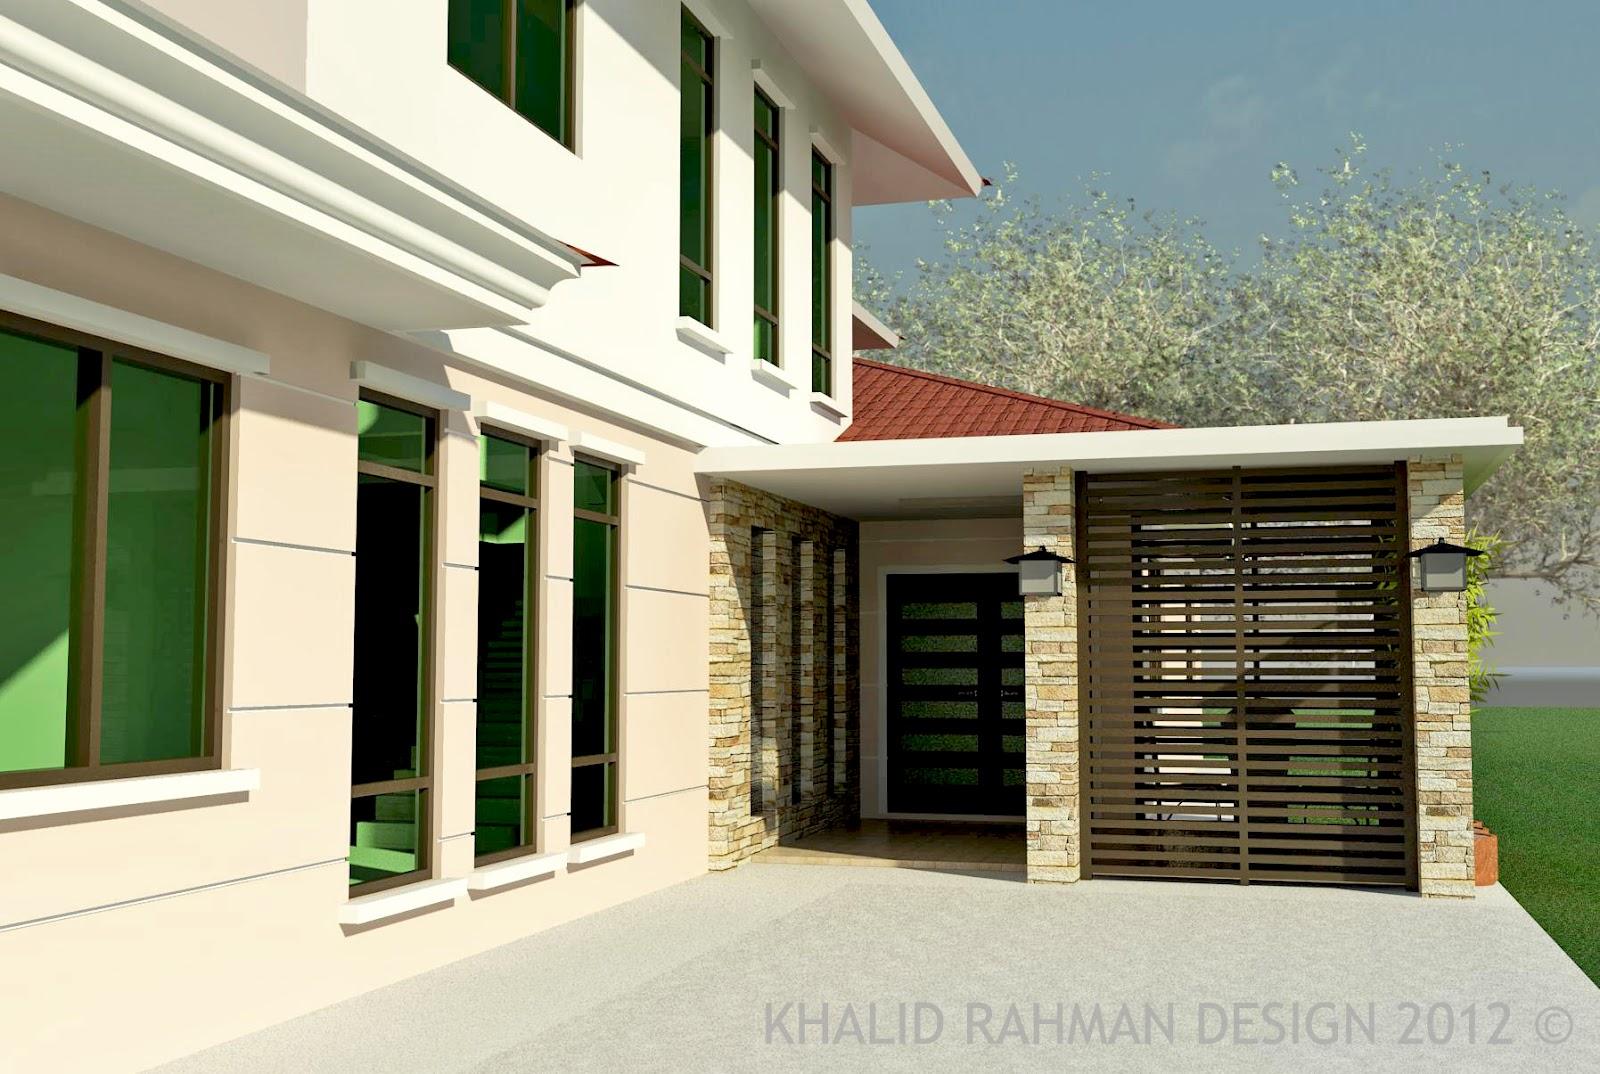 Khalid Rahman Design on house design in malaysia, house design in usa, house design in uae, house design in thailand,